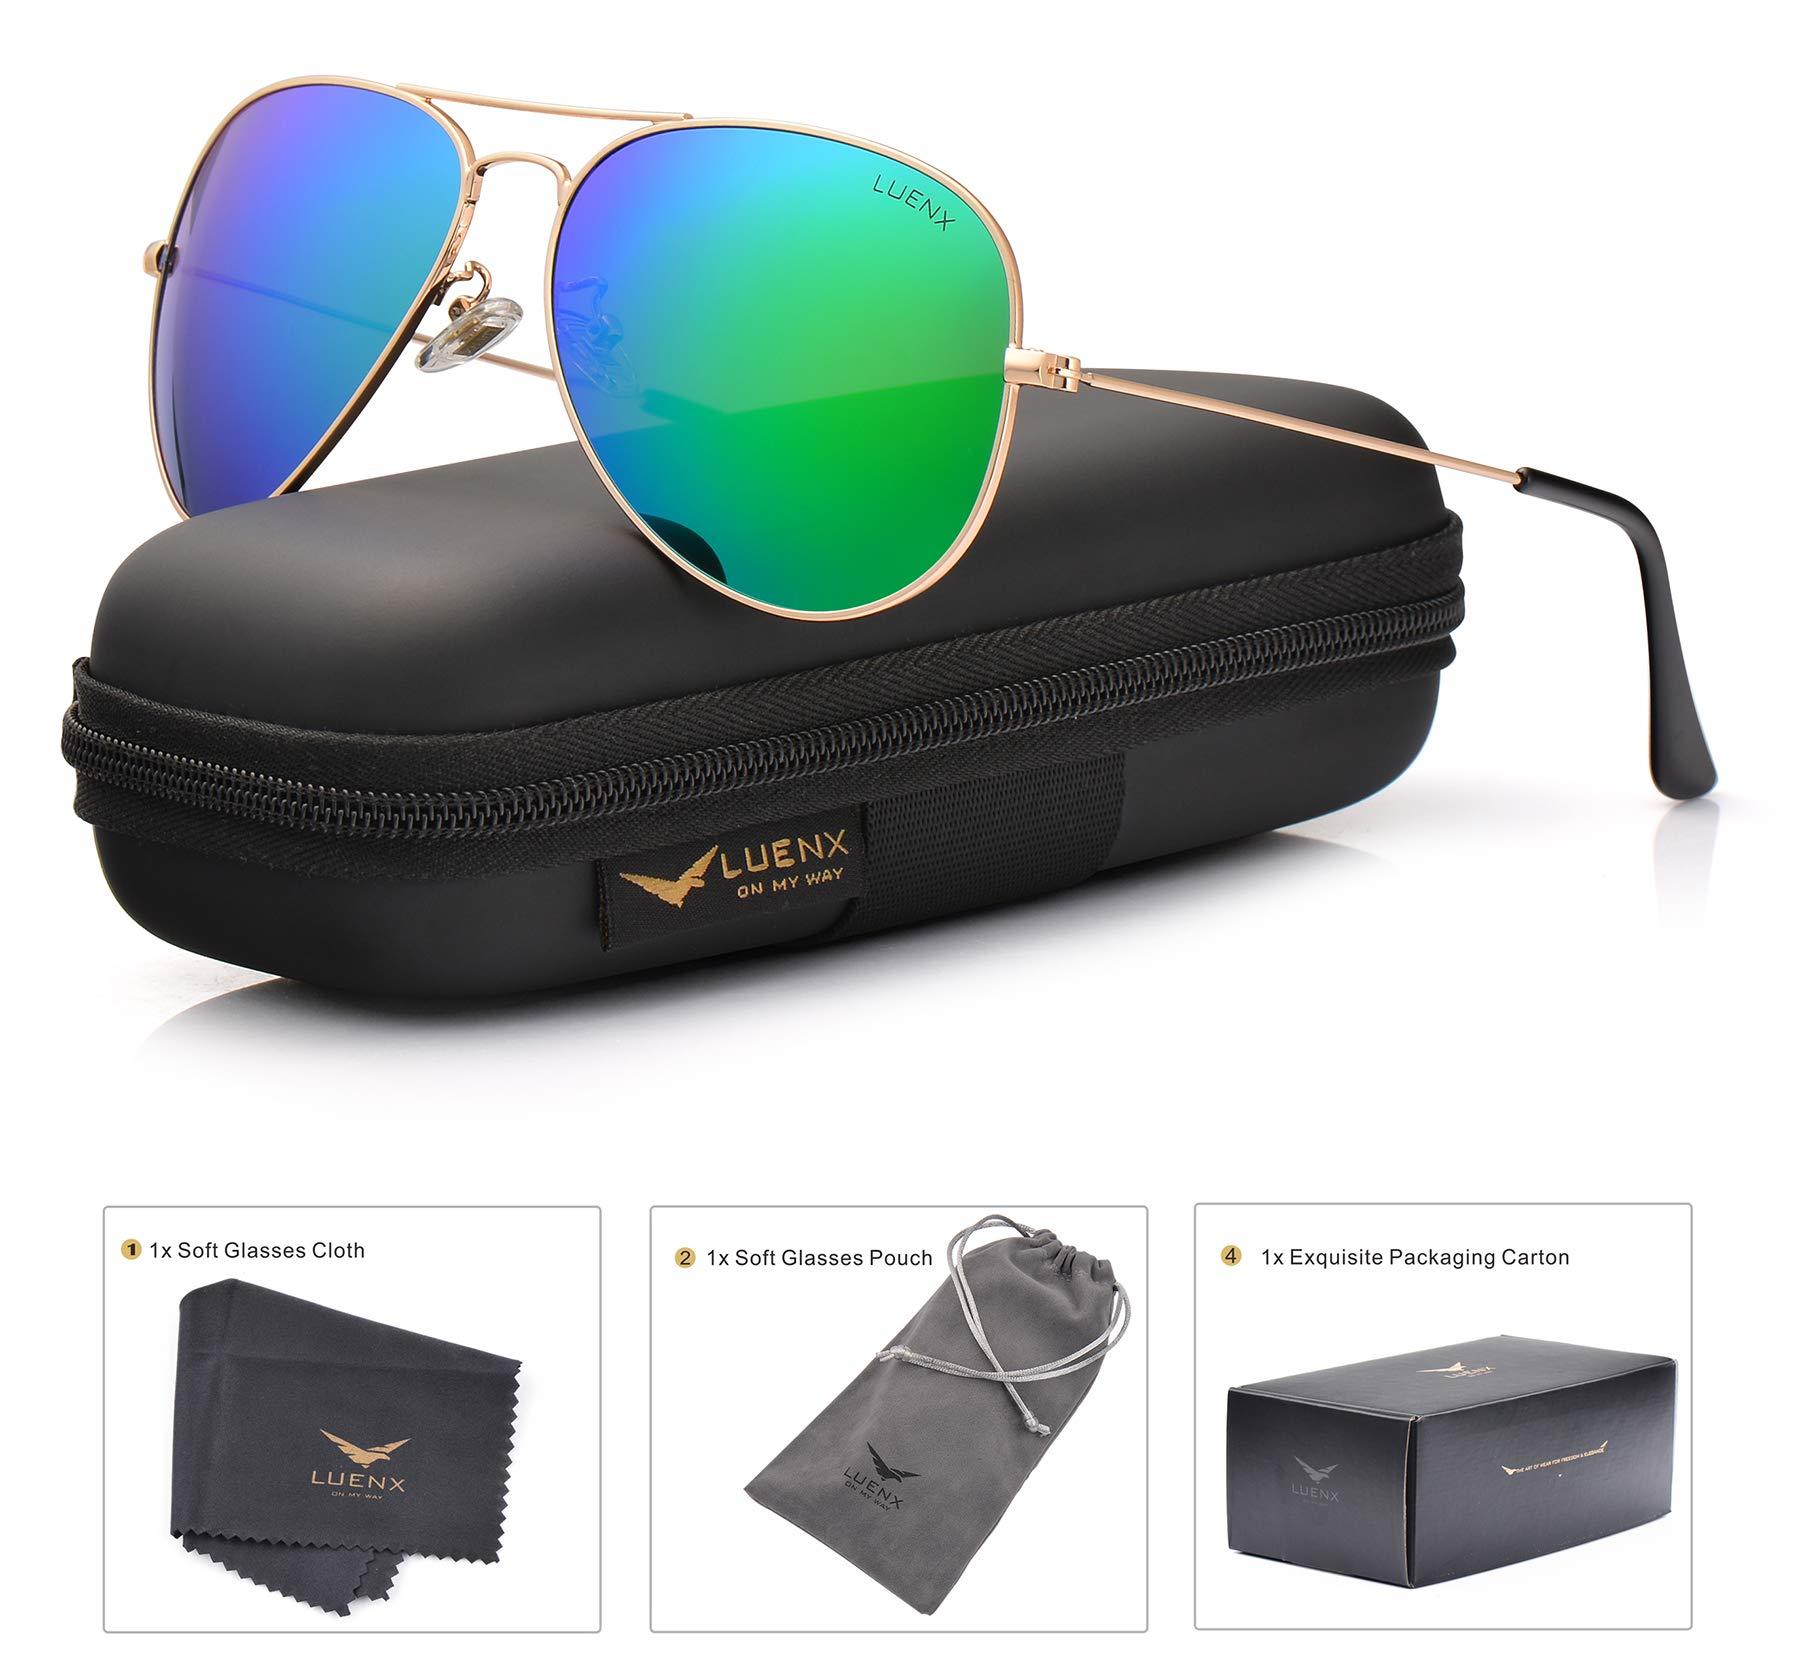 LUENX Aviator Sunglasses Men Women Polarized Green Mirrored Lens Metal Frame UV 400 Protection Case Classic Style